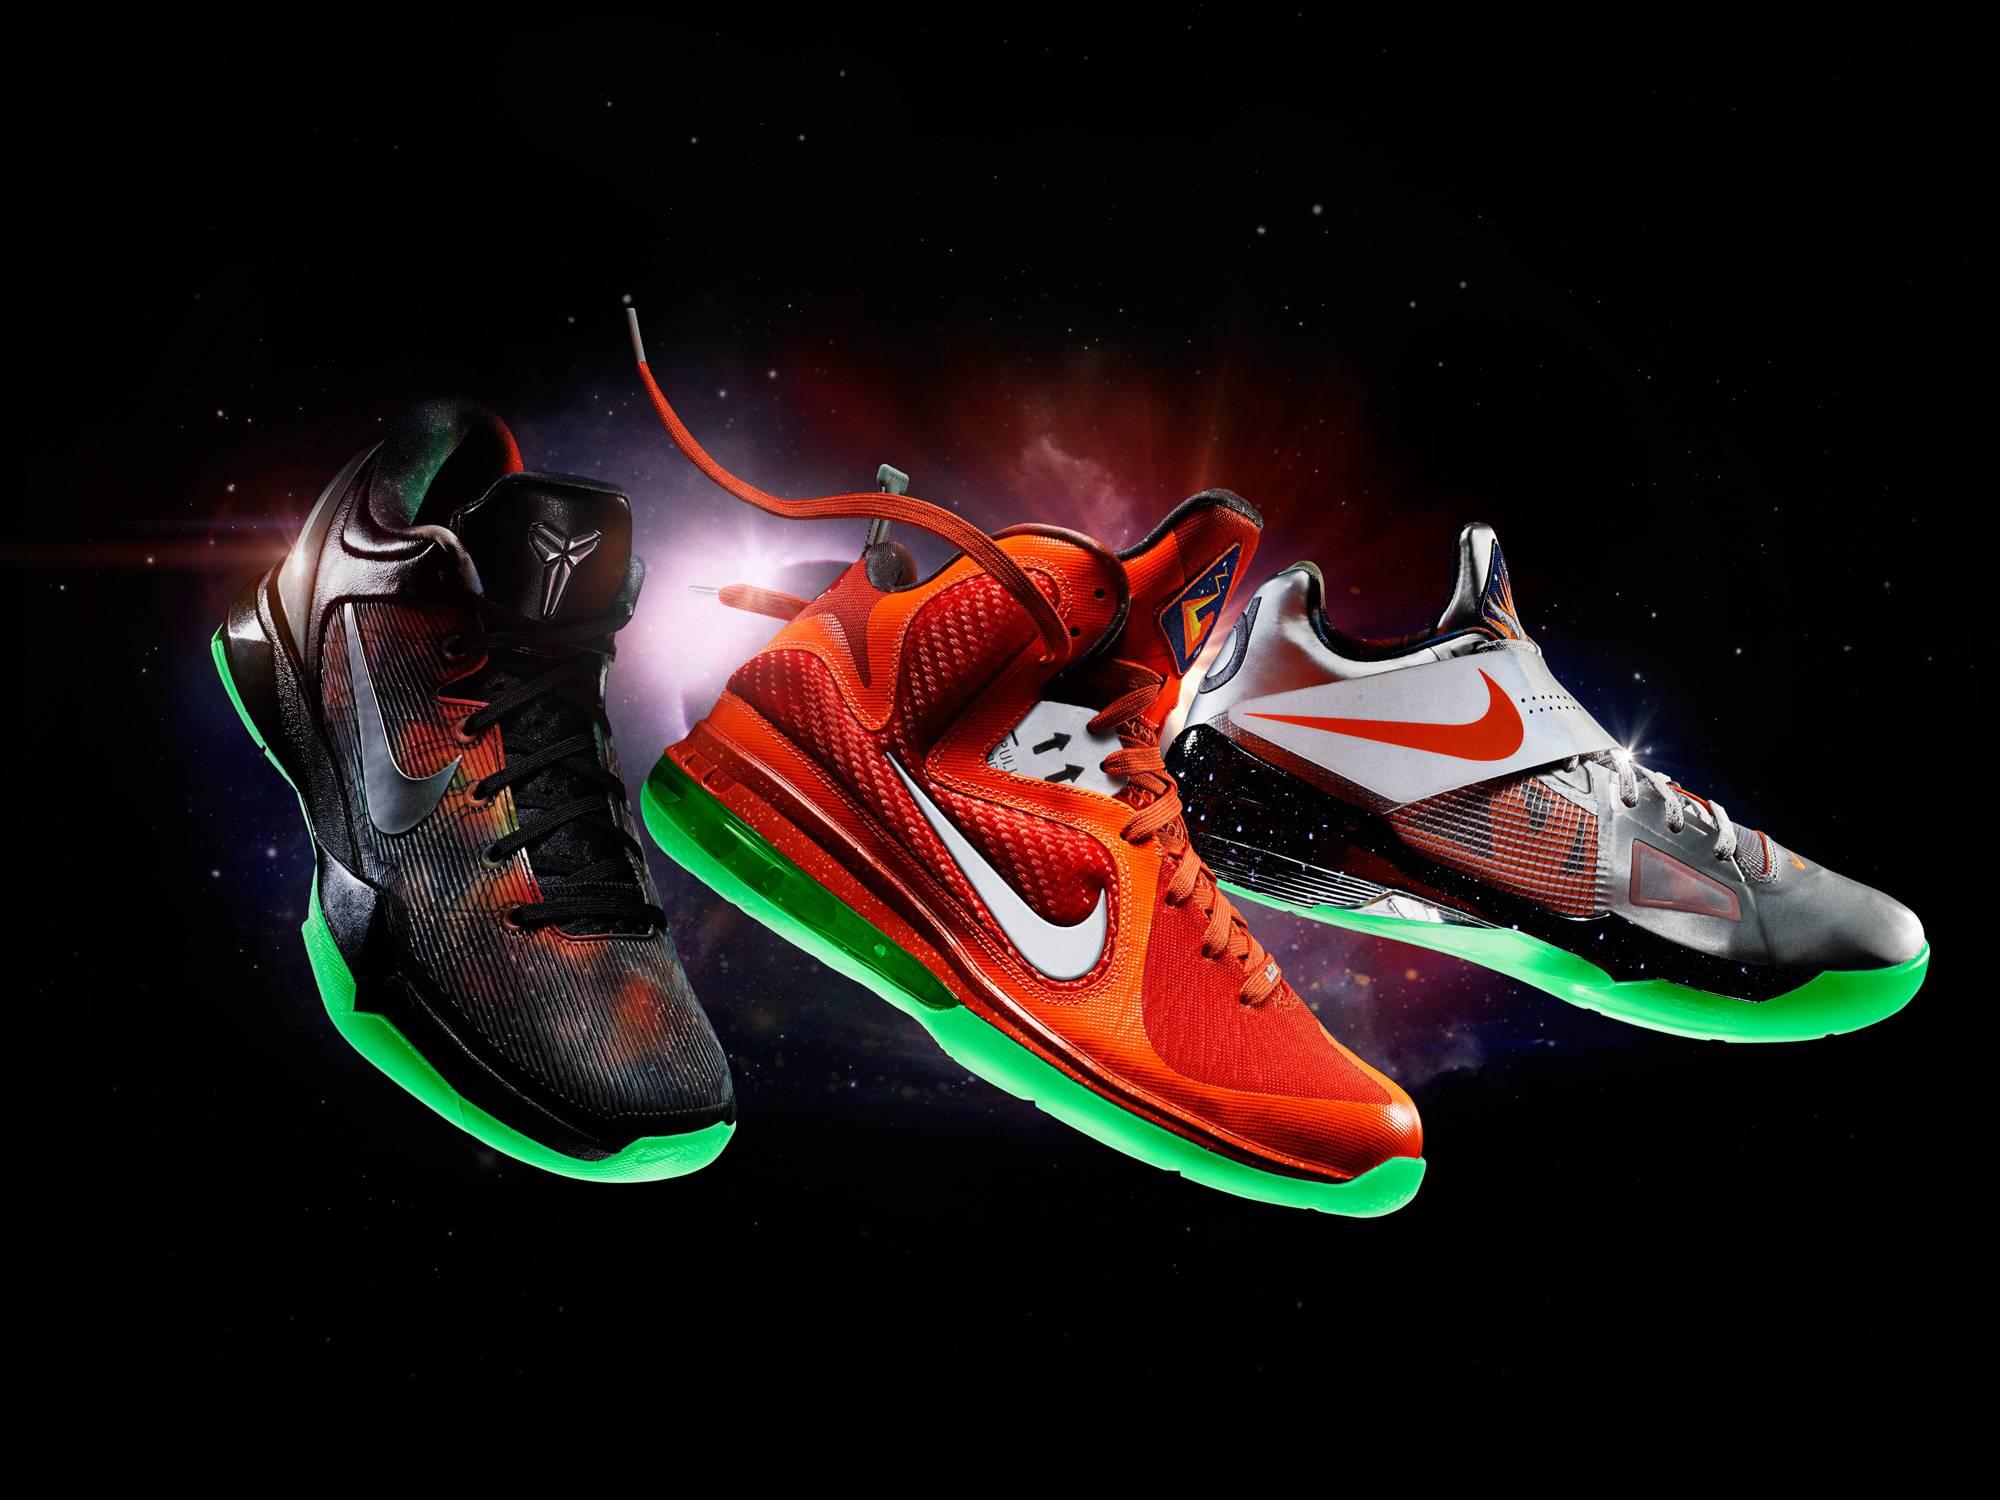 nike shoes wallpaper hd